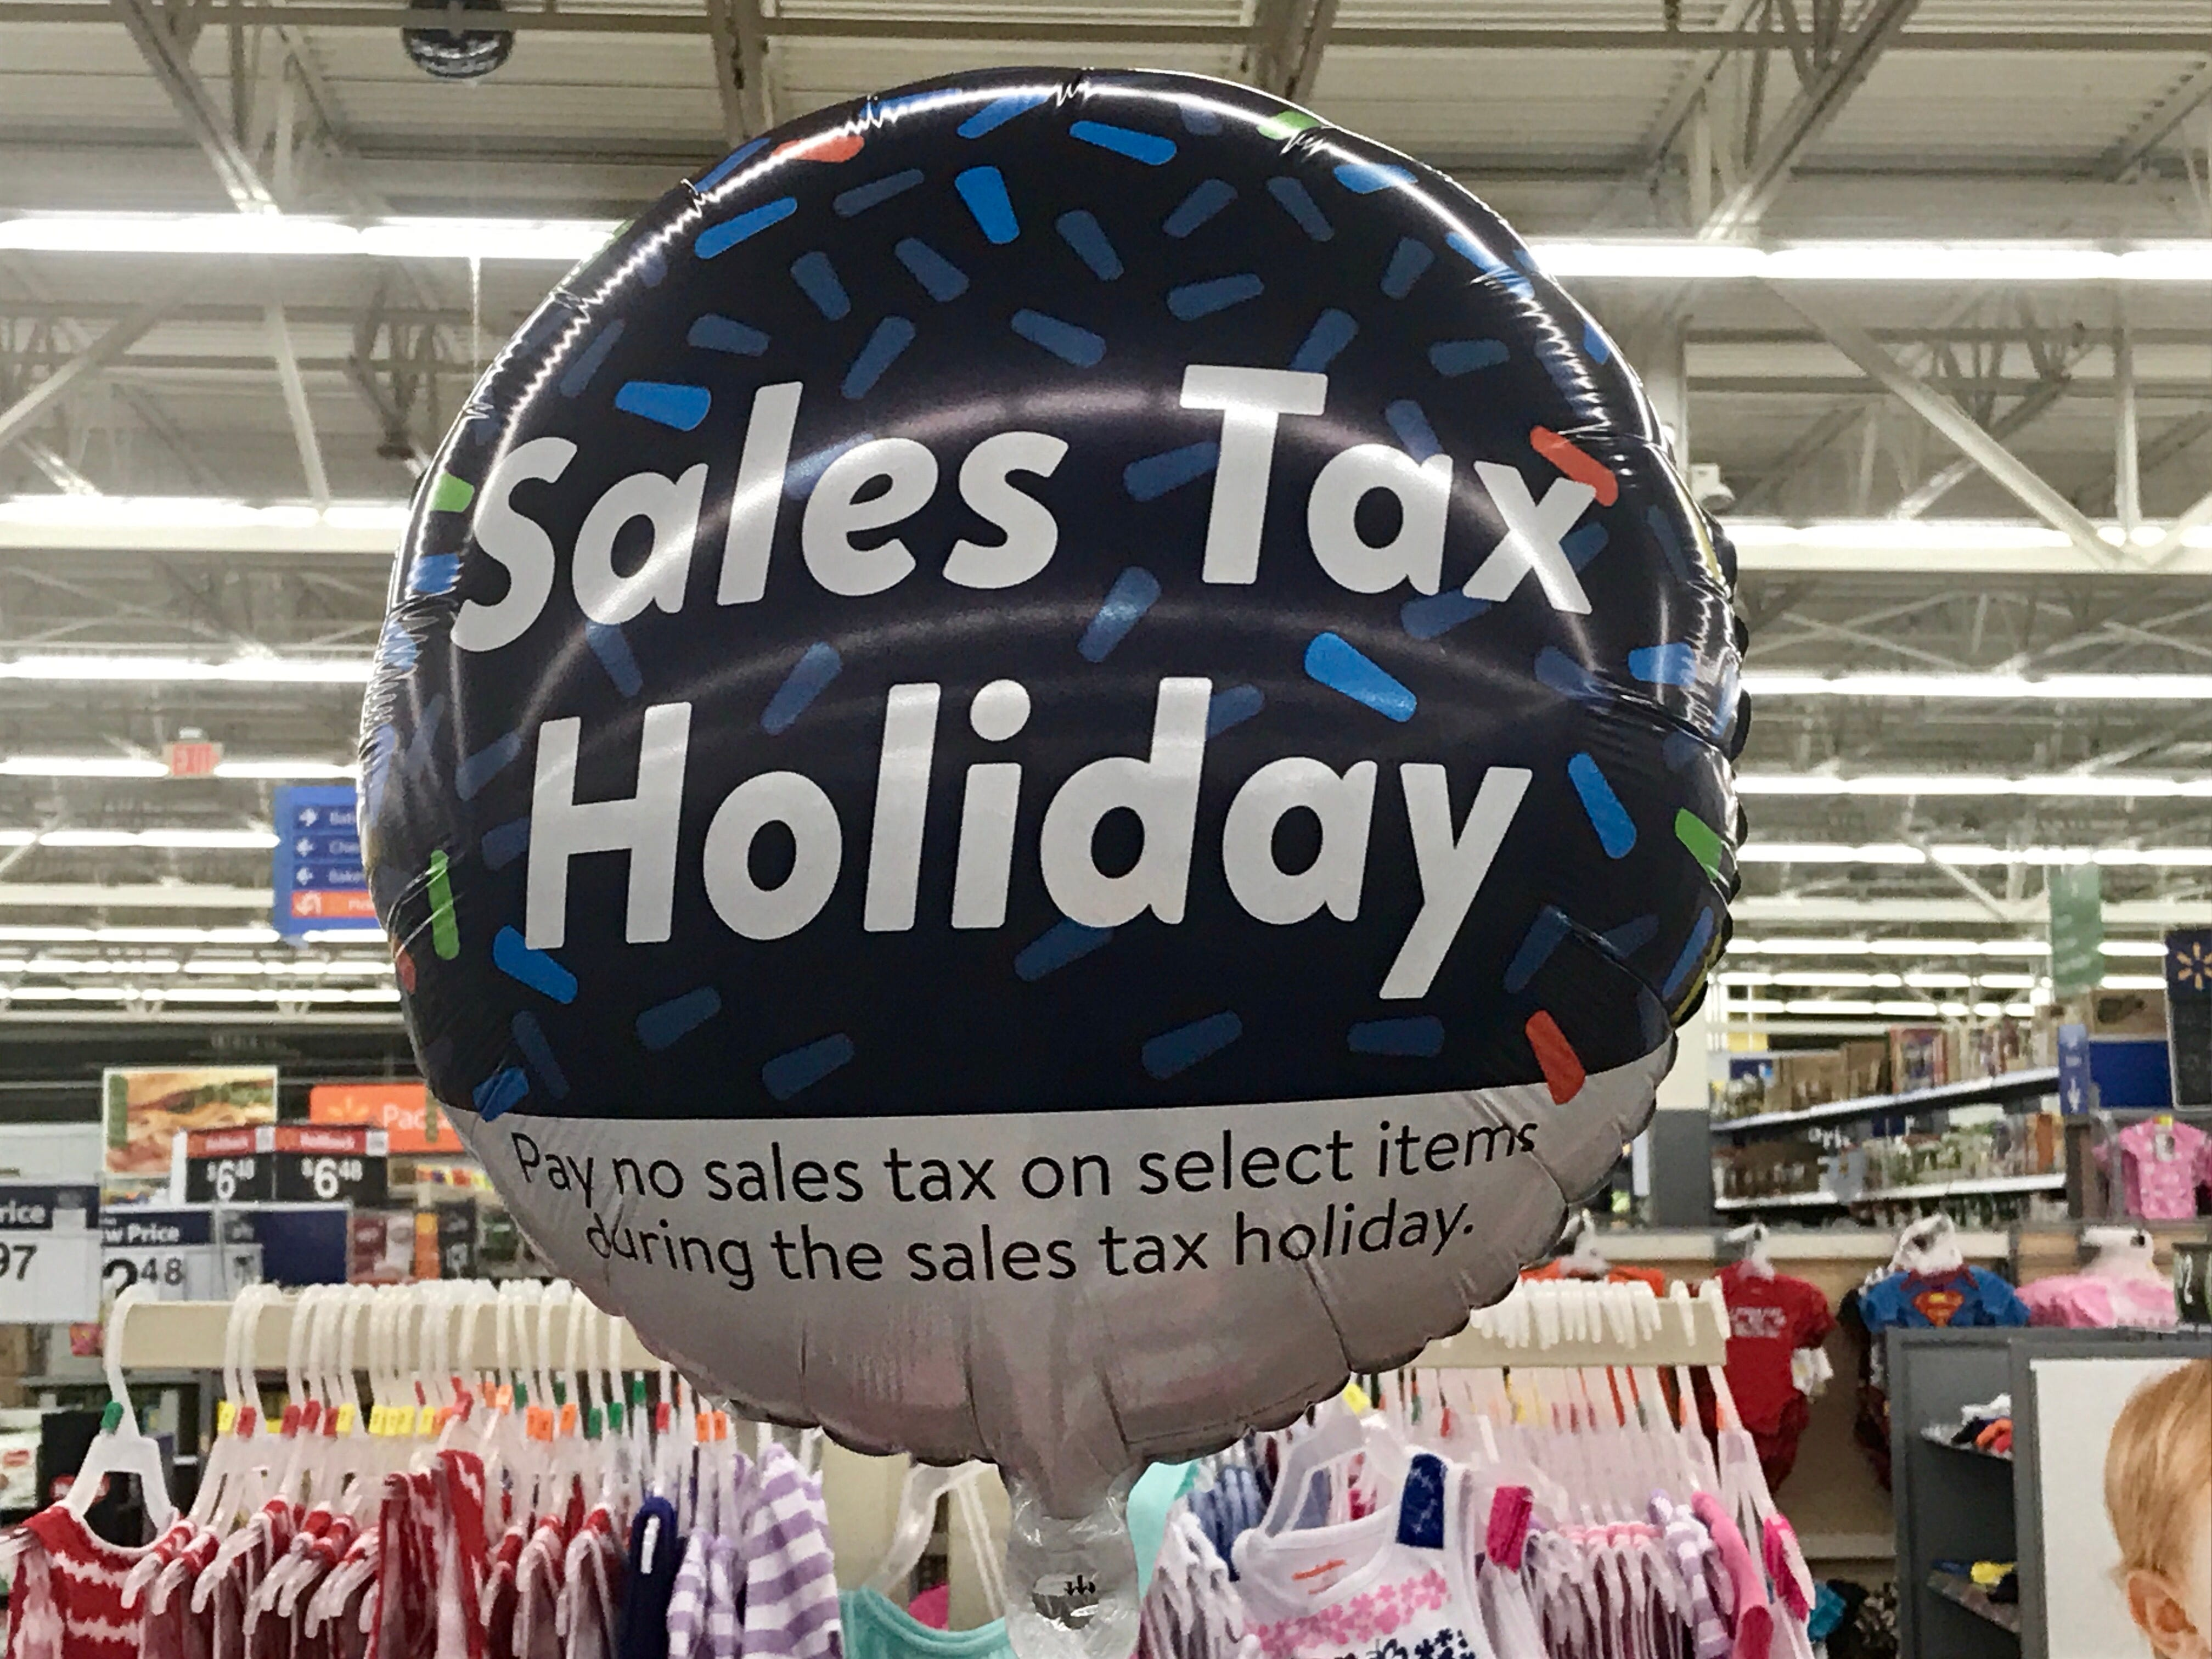 Sales tax holiday balloon